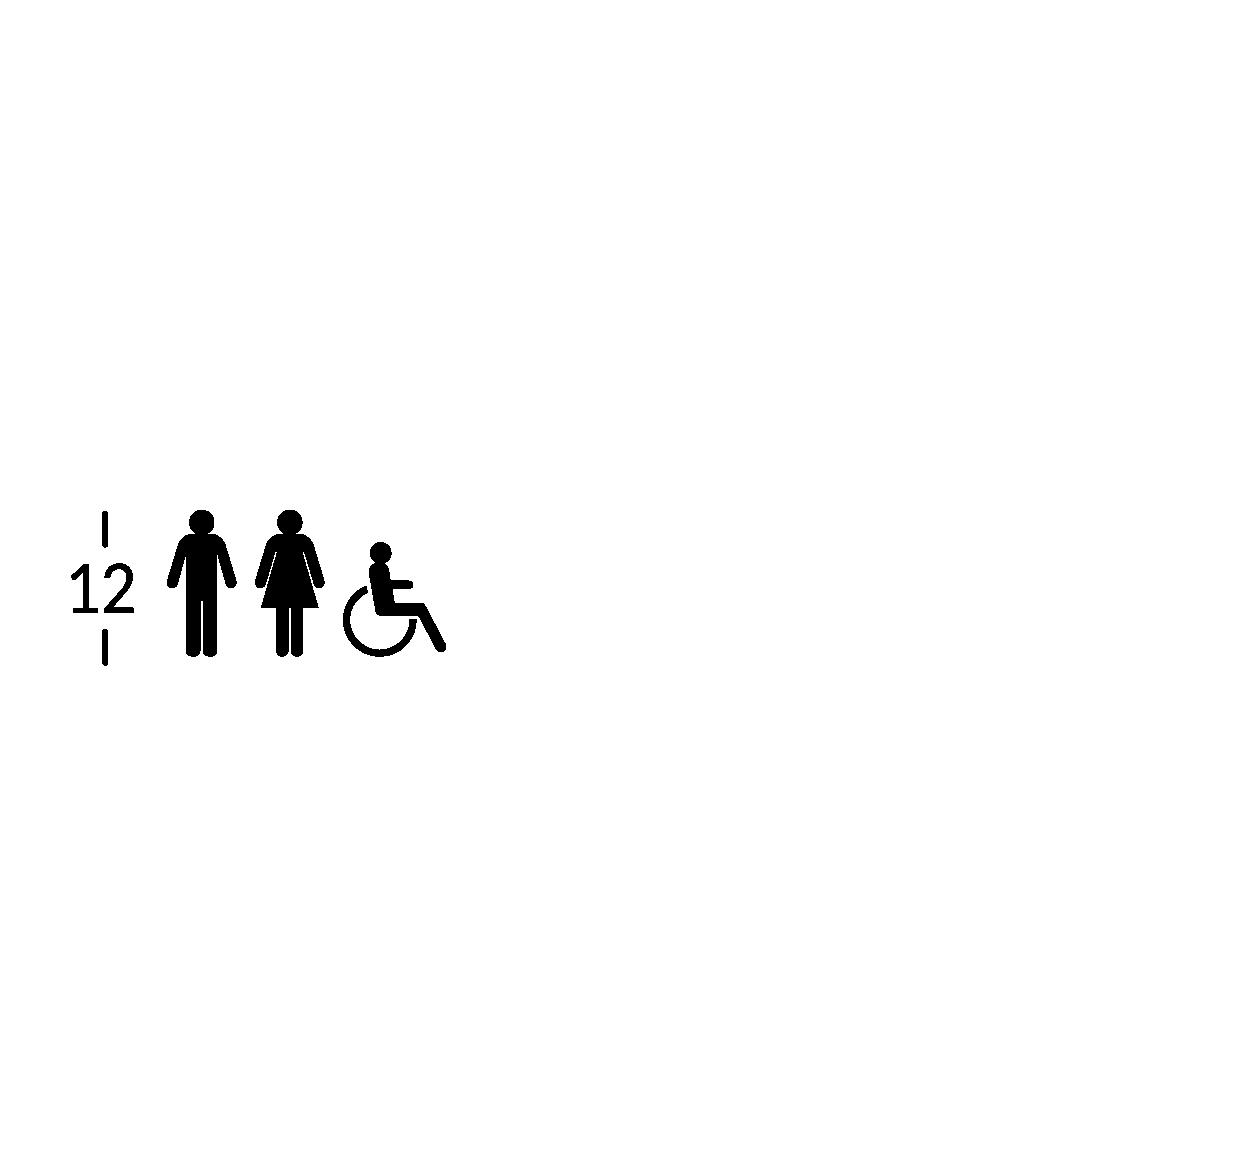 Simbolo